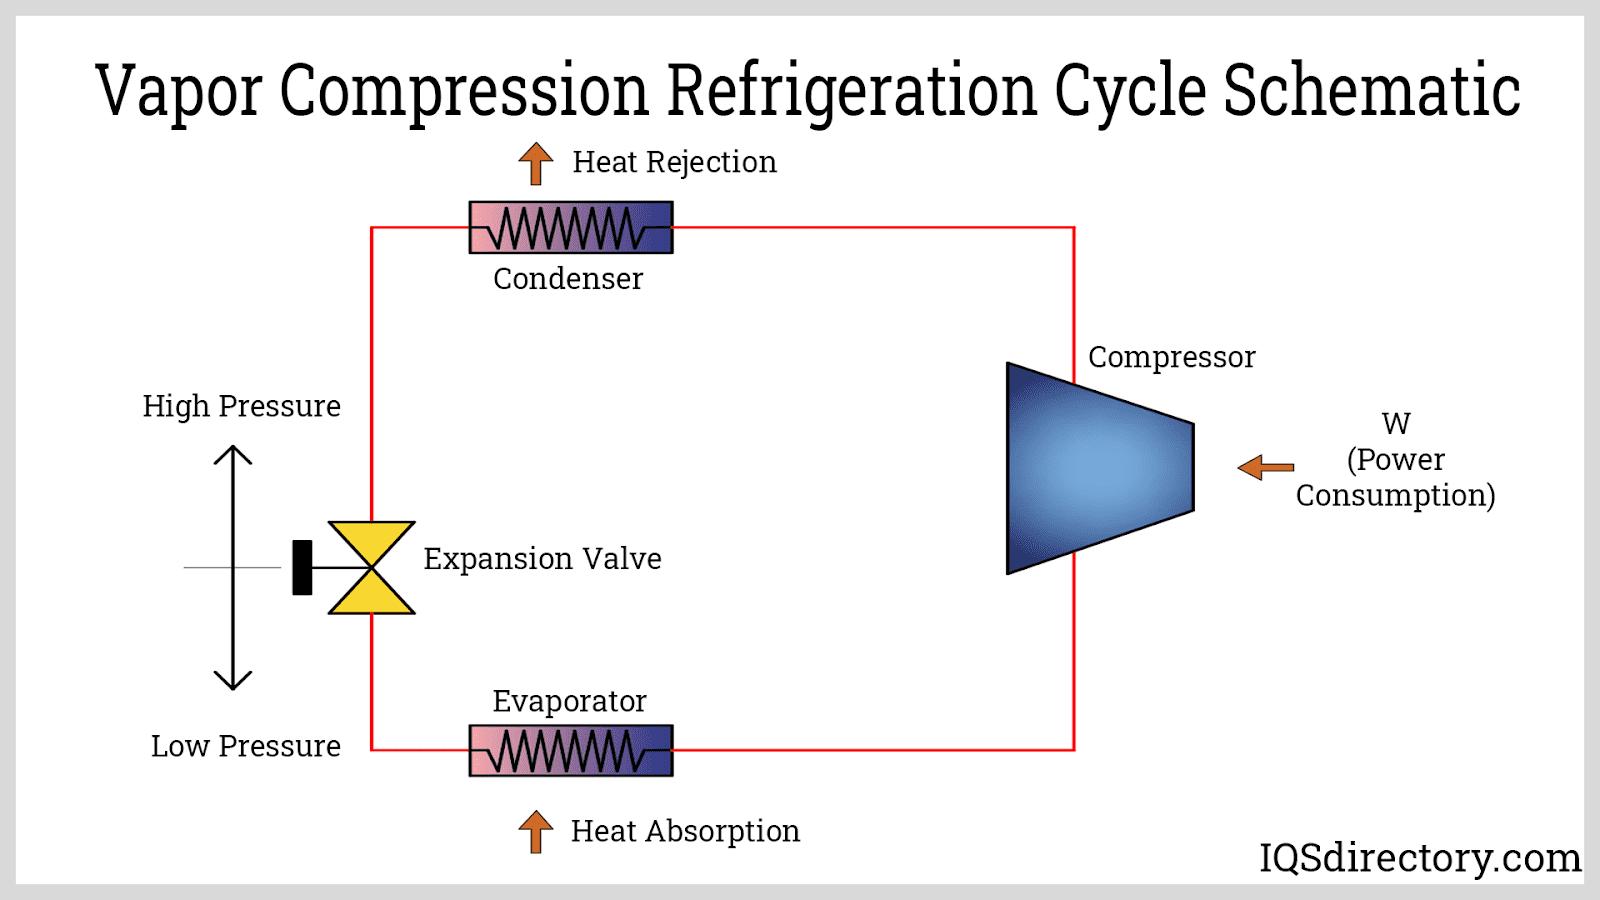 Vapor Compression Refigeration Cycle Schematic